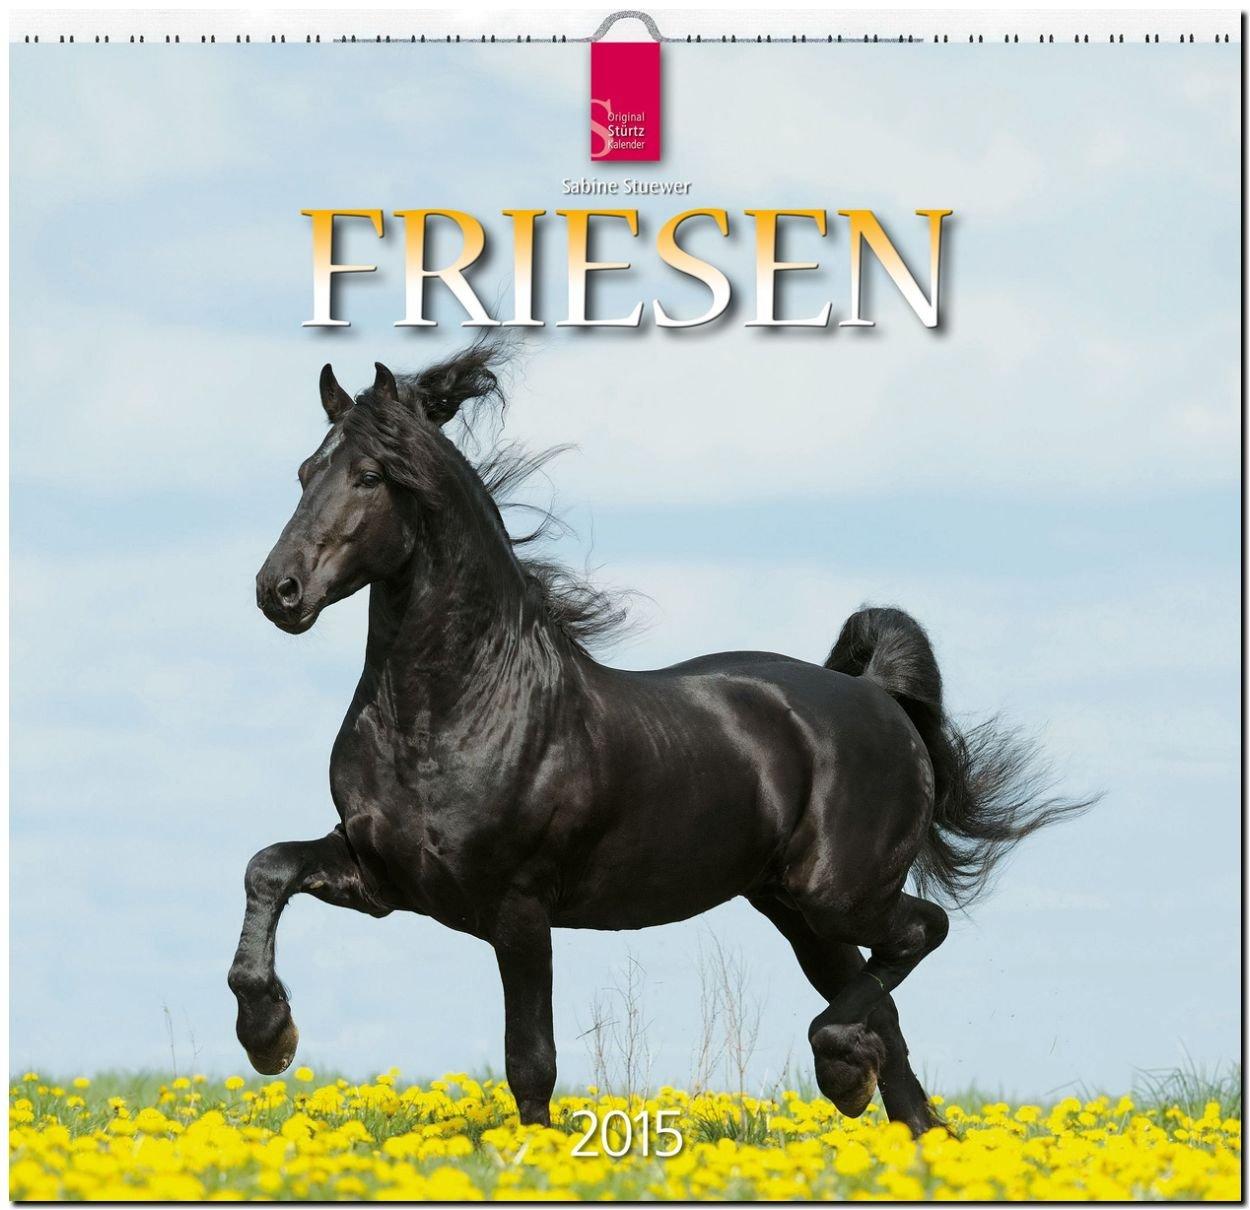 Friesen 2015 - Original Stürtz-Kalender - Mittelformat-Kalender 33 x 31 cm